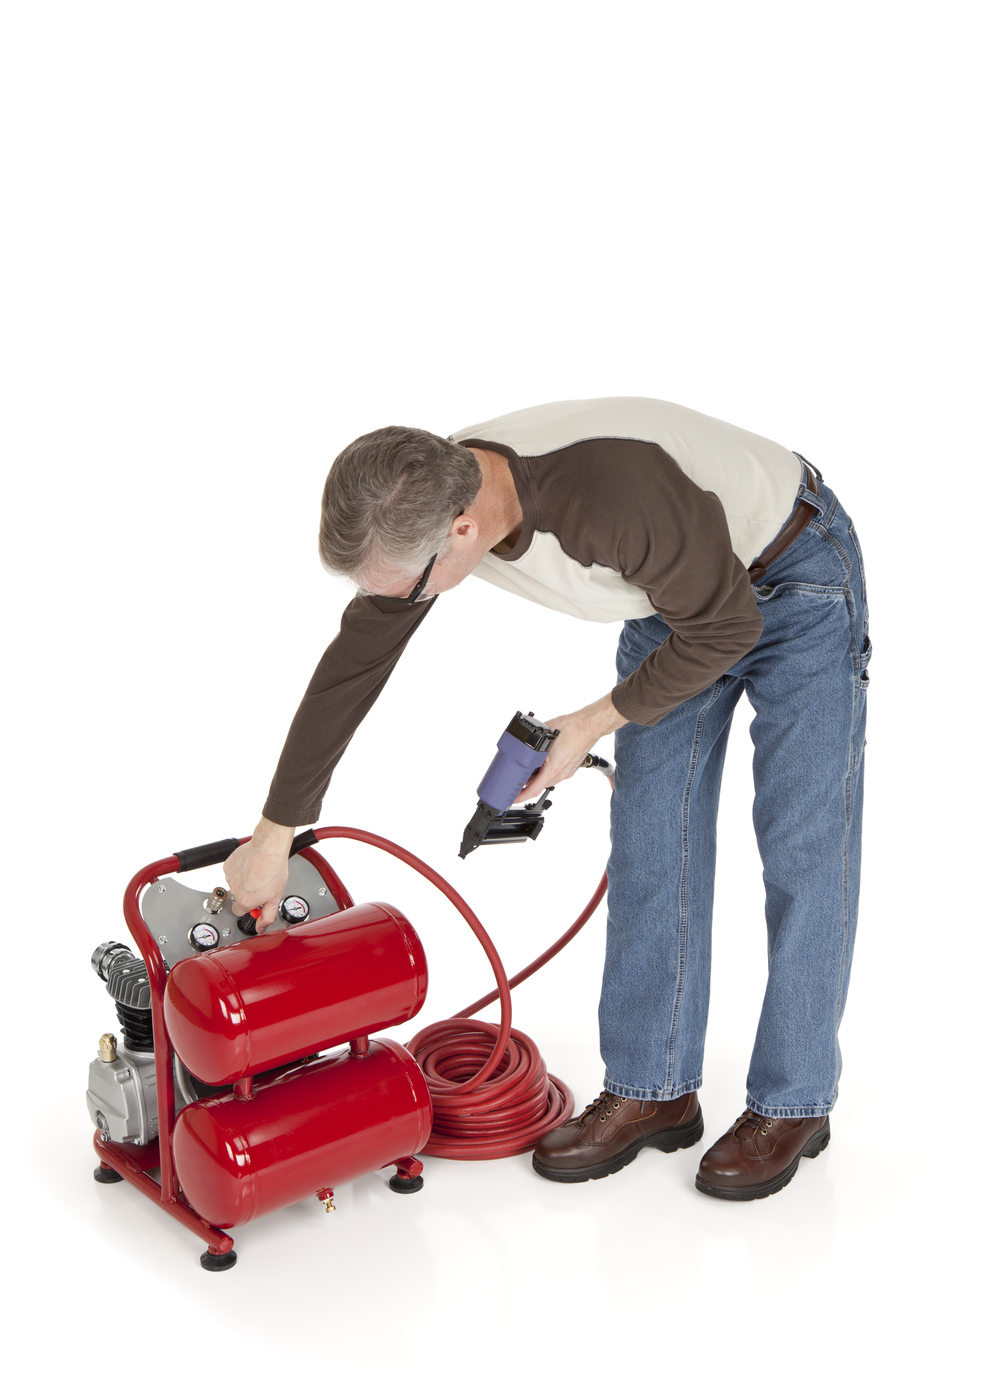 Air compressor, air tool